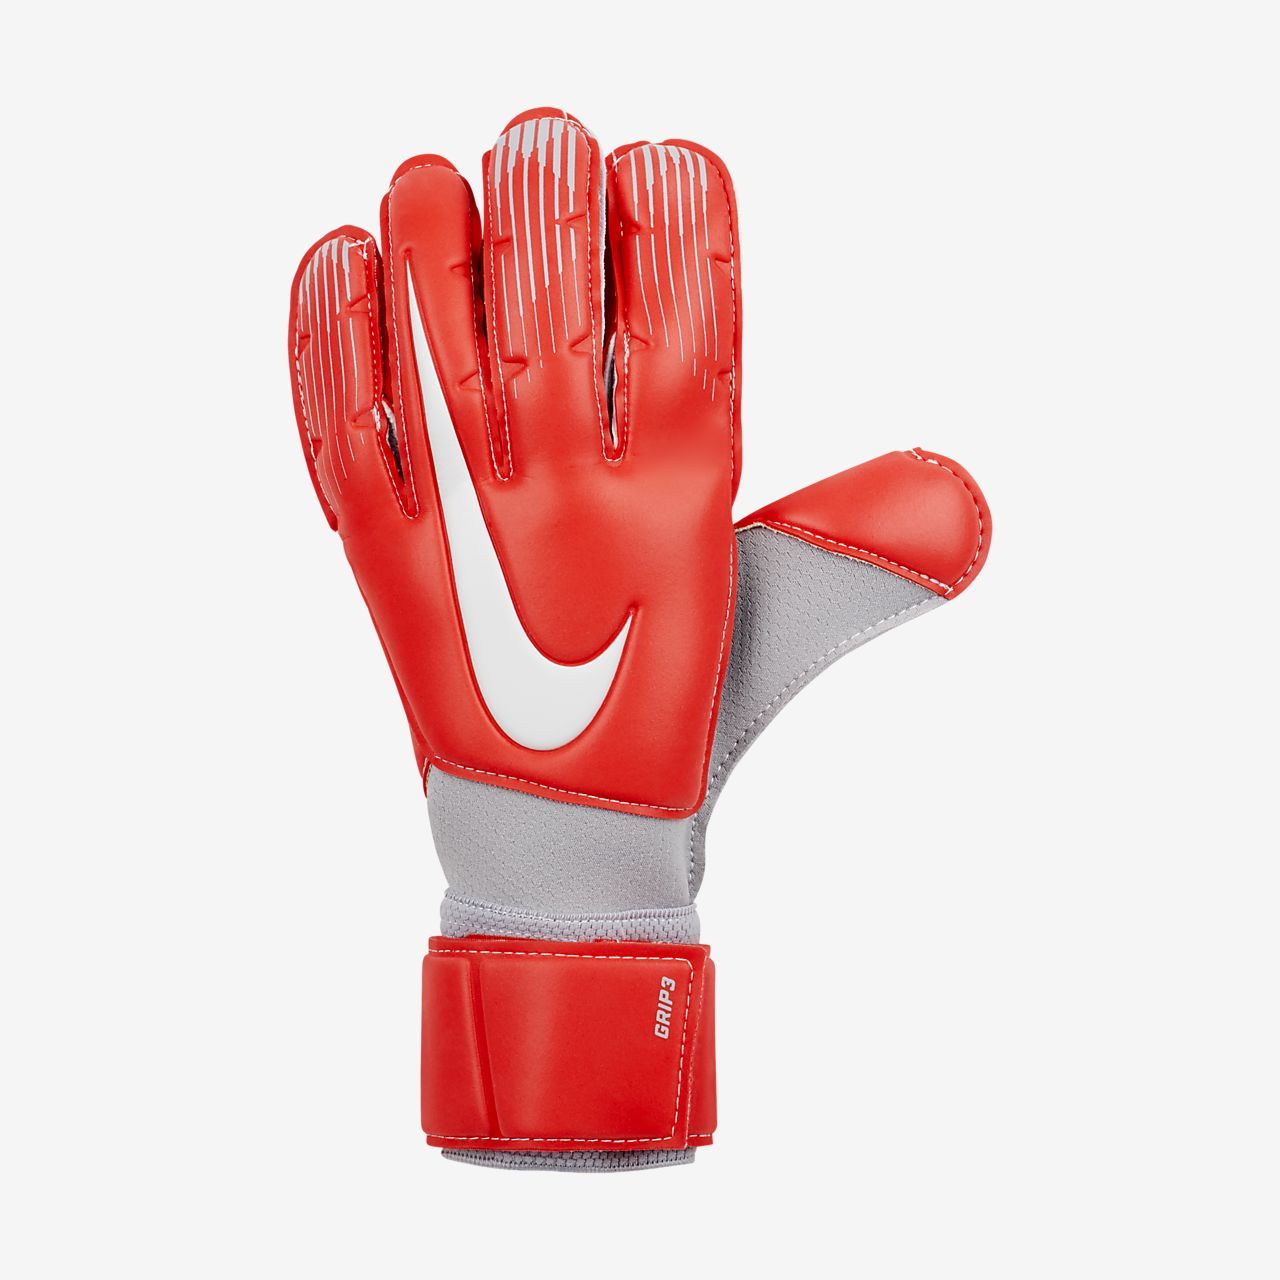 Gants de football Nike Grip3 Goalkeeper